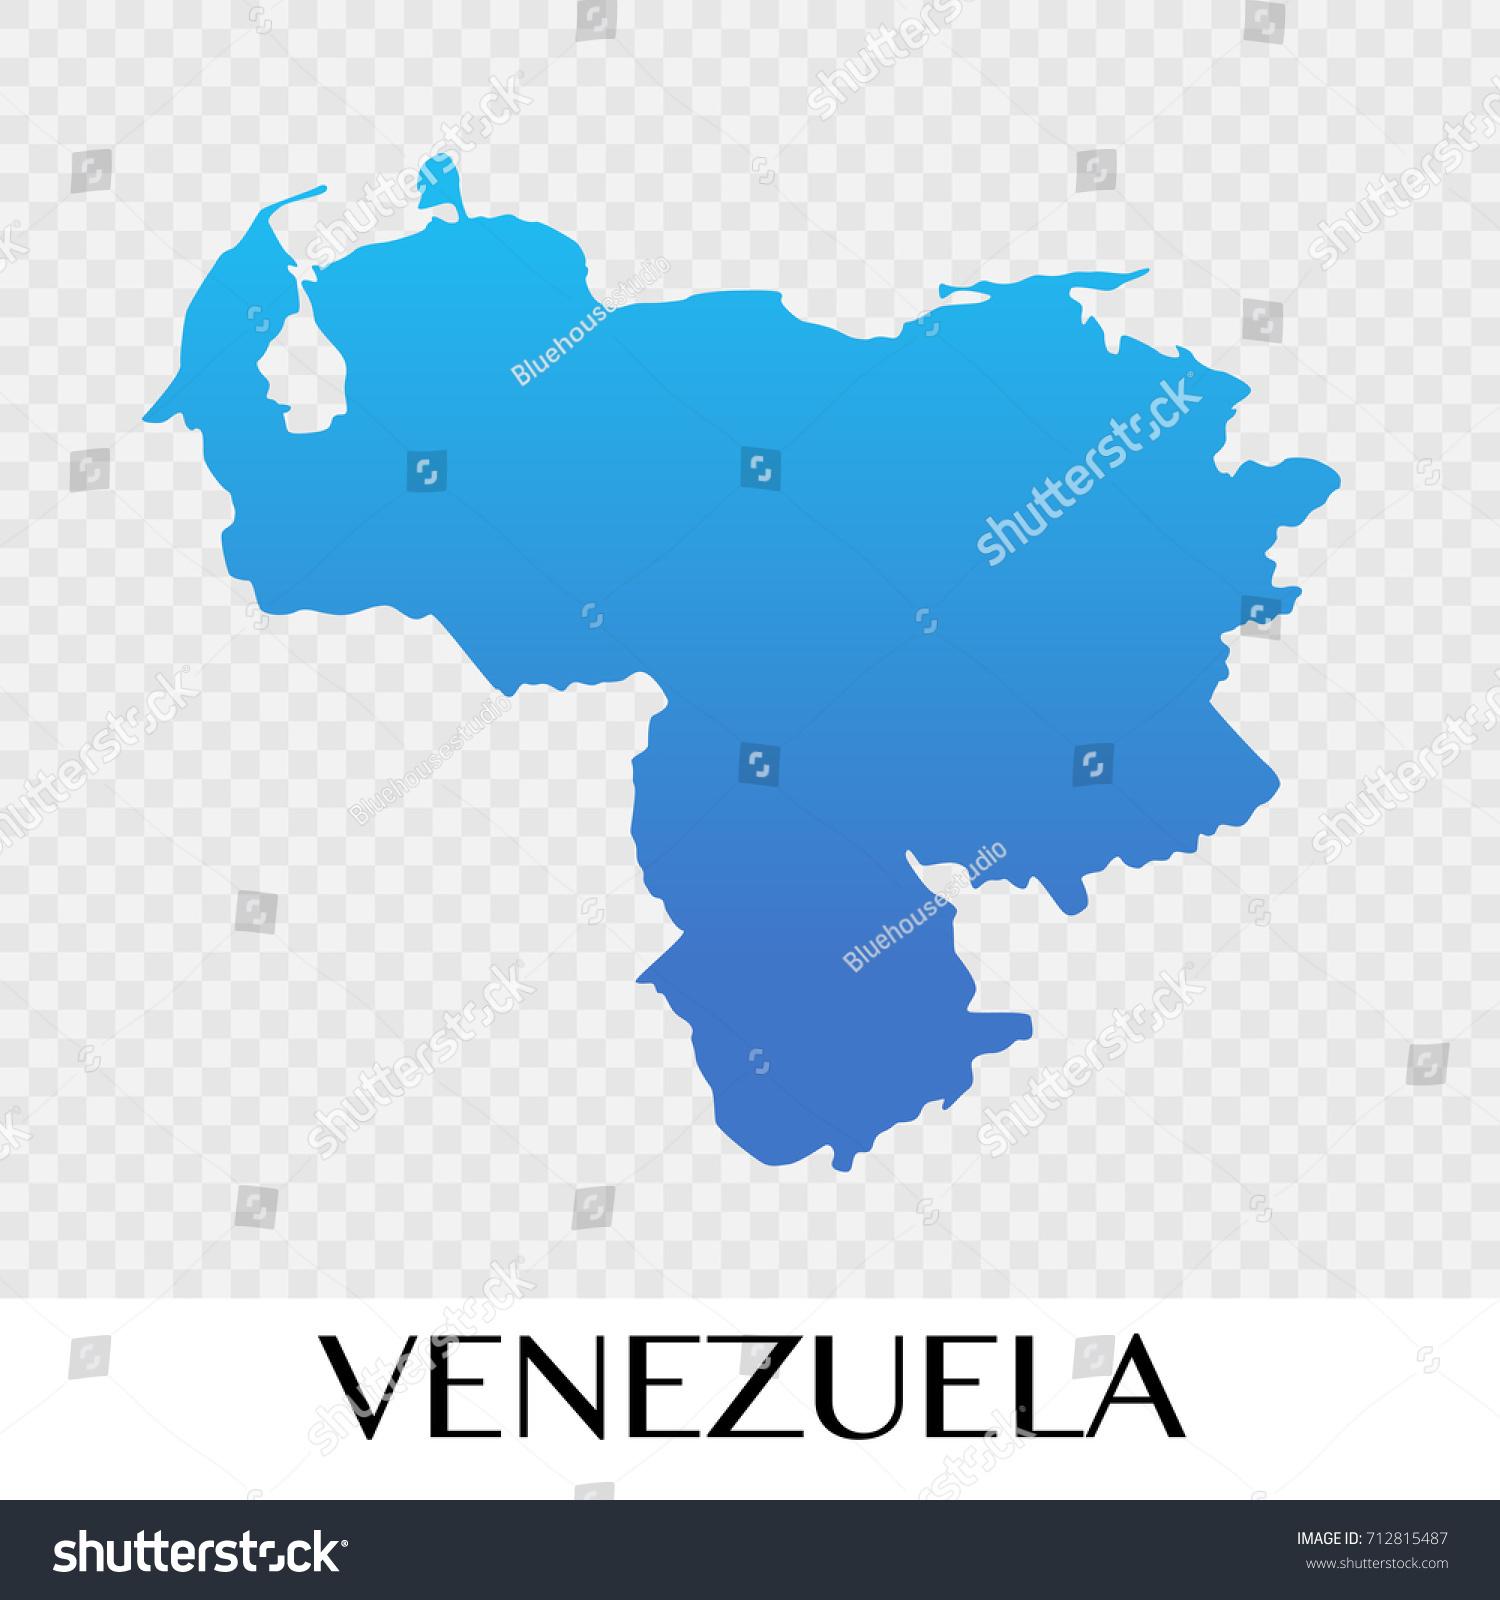 Venezuela Map South America Continent Illustration Stock Vector - Map of venezuela south america